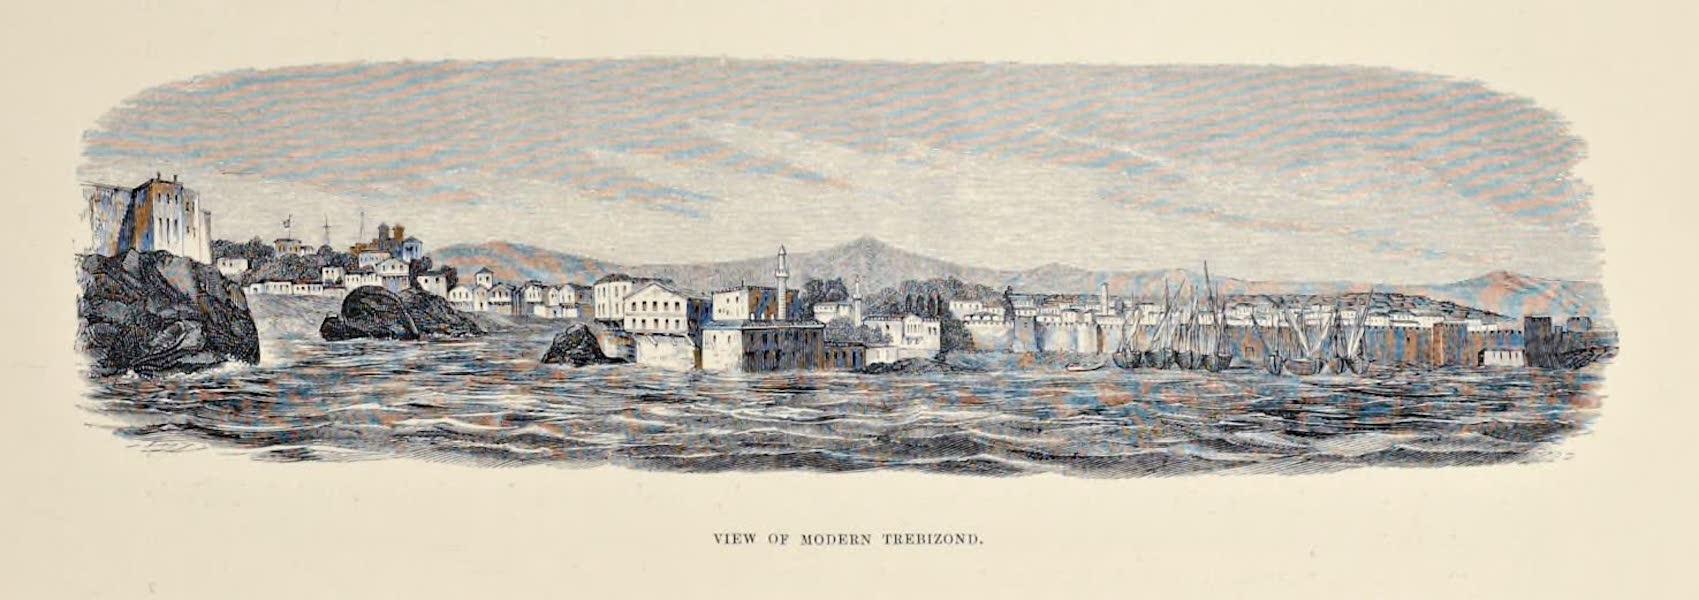 Byzantine Architecture - View of Modern Trebizond  (1864)